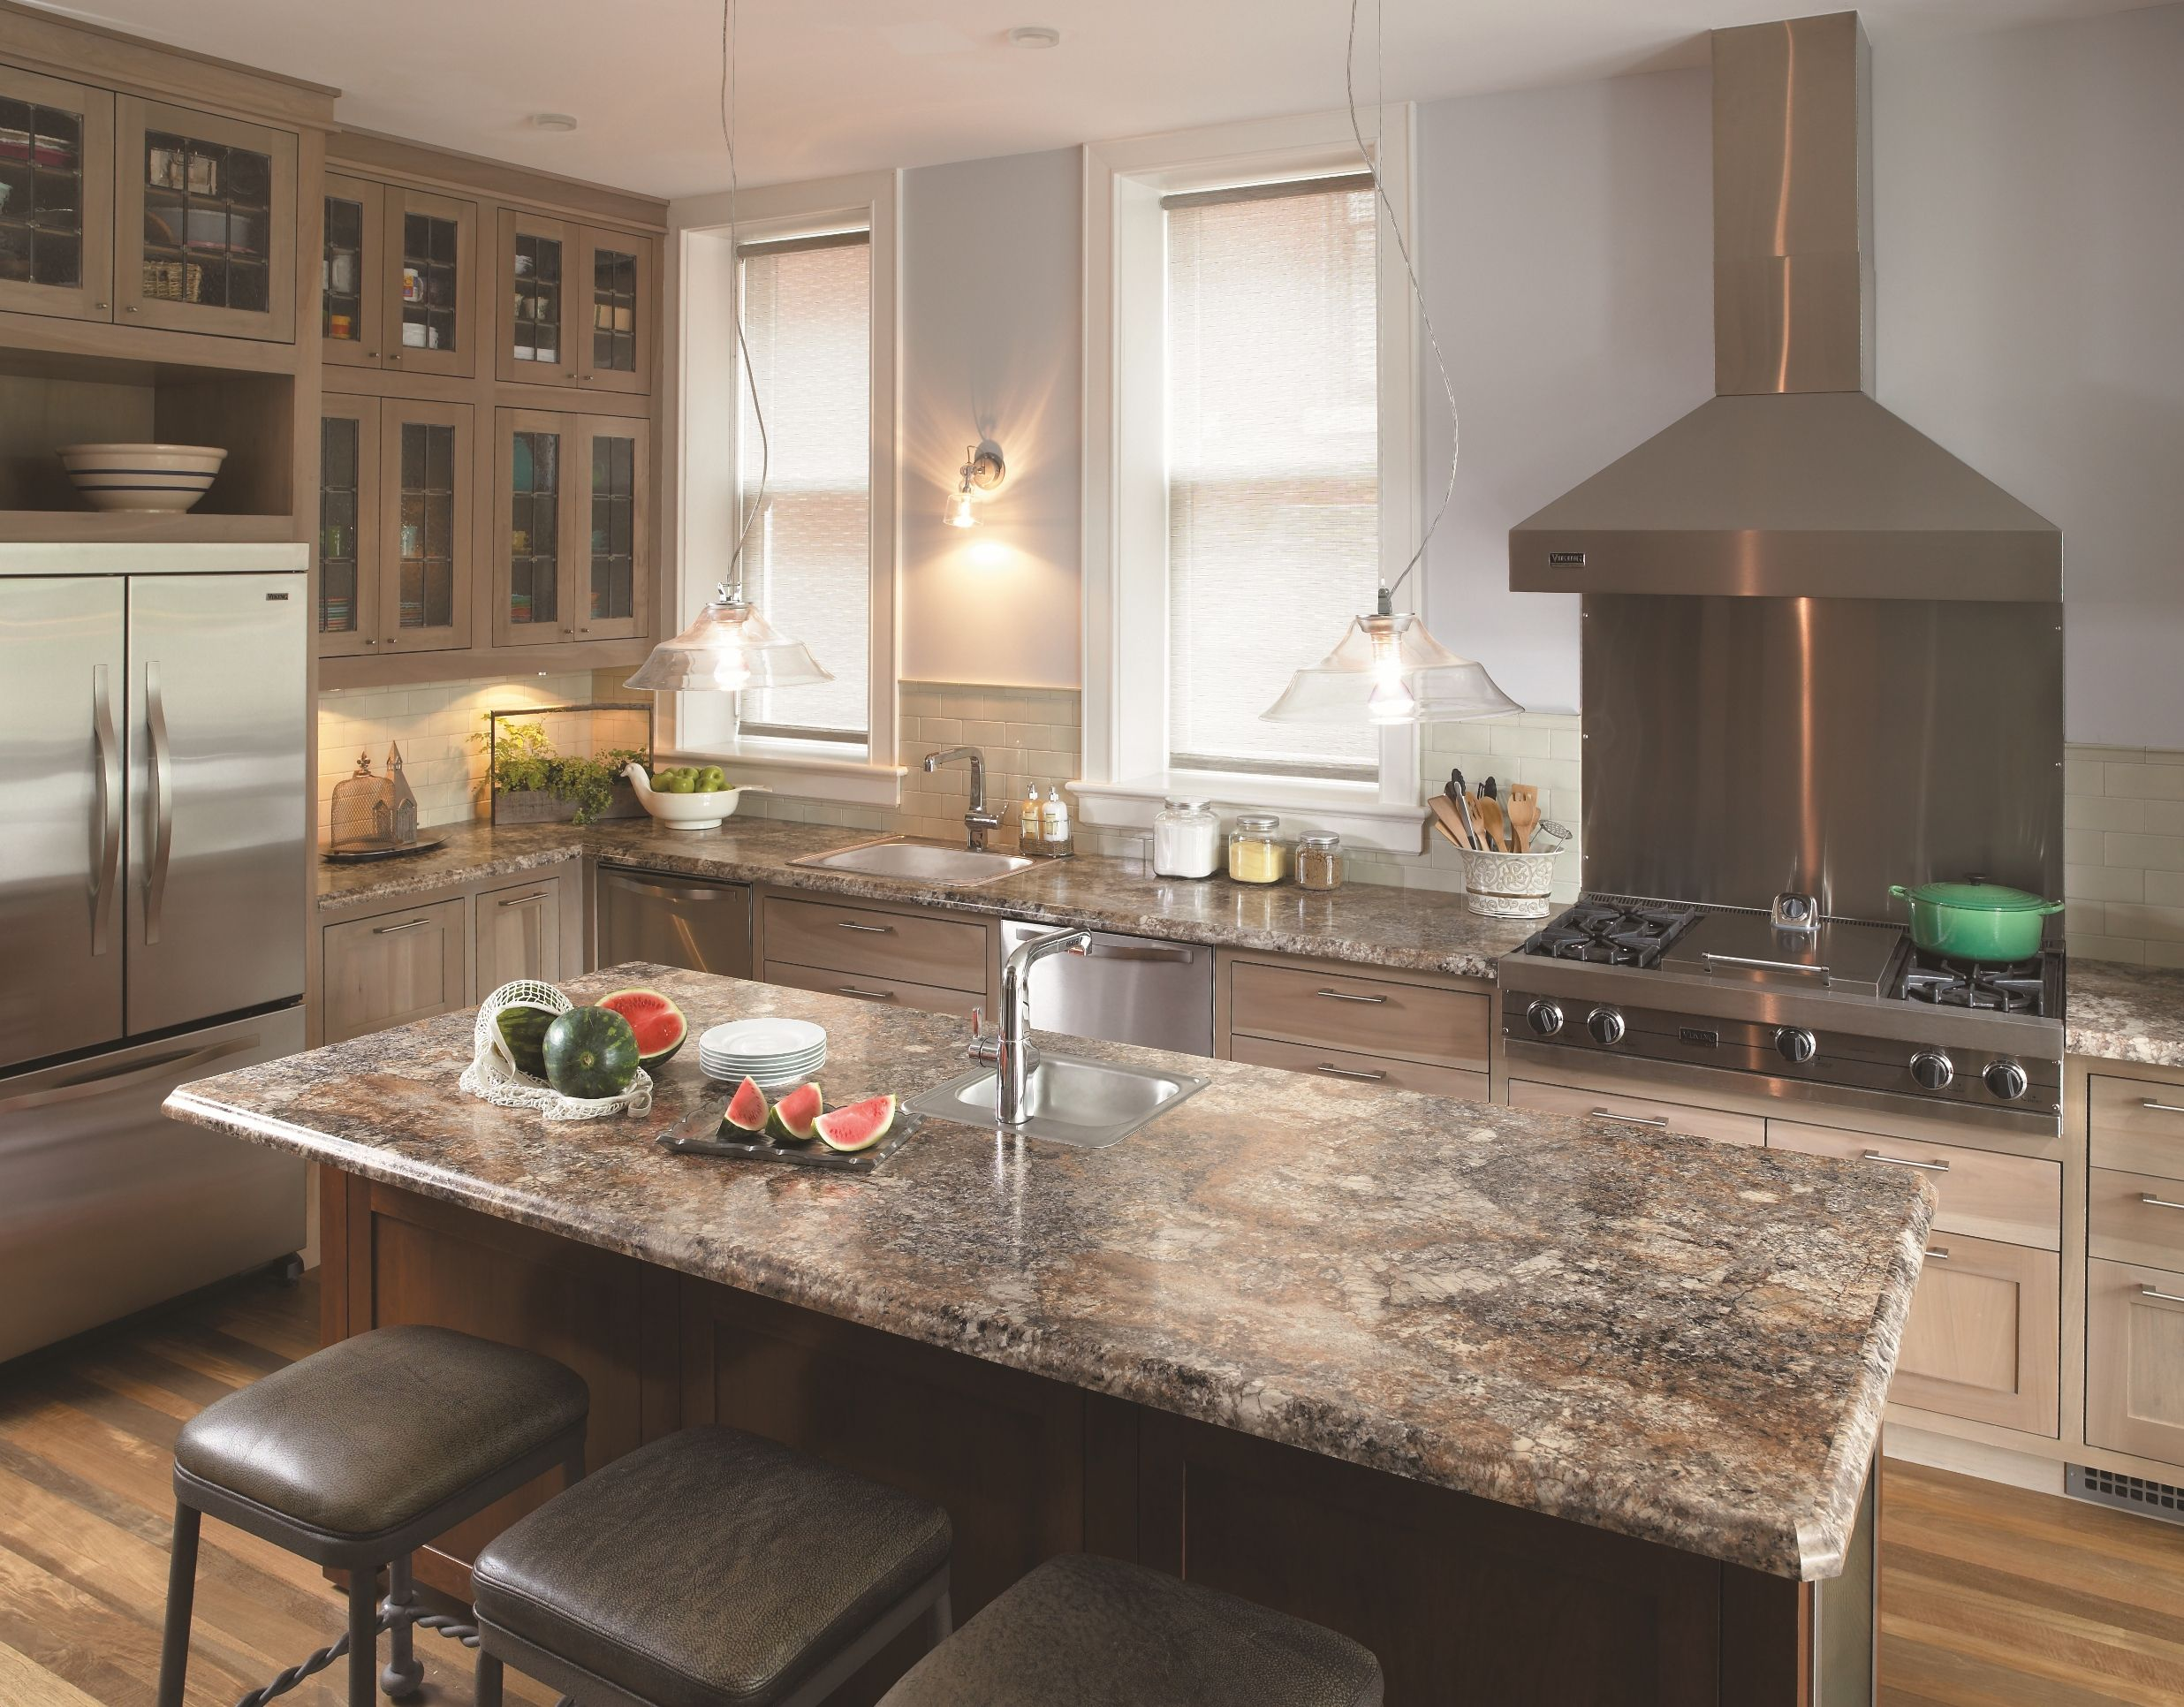 update your countertops formica kitchen countertops Antique Mascarello interiordesign kitchen countertop